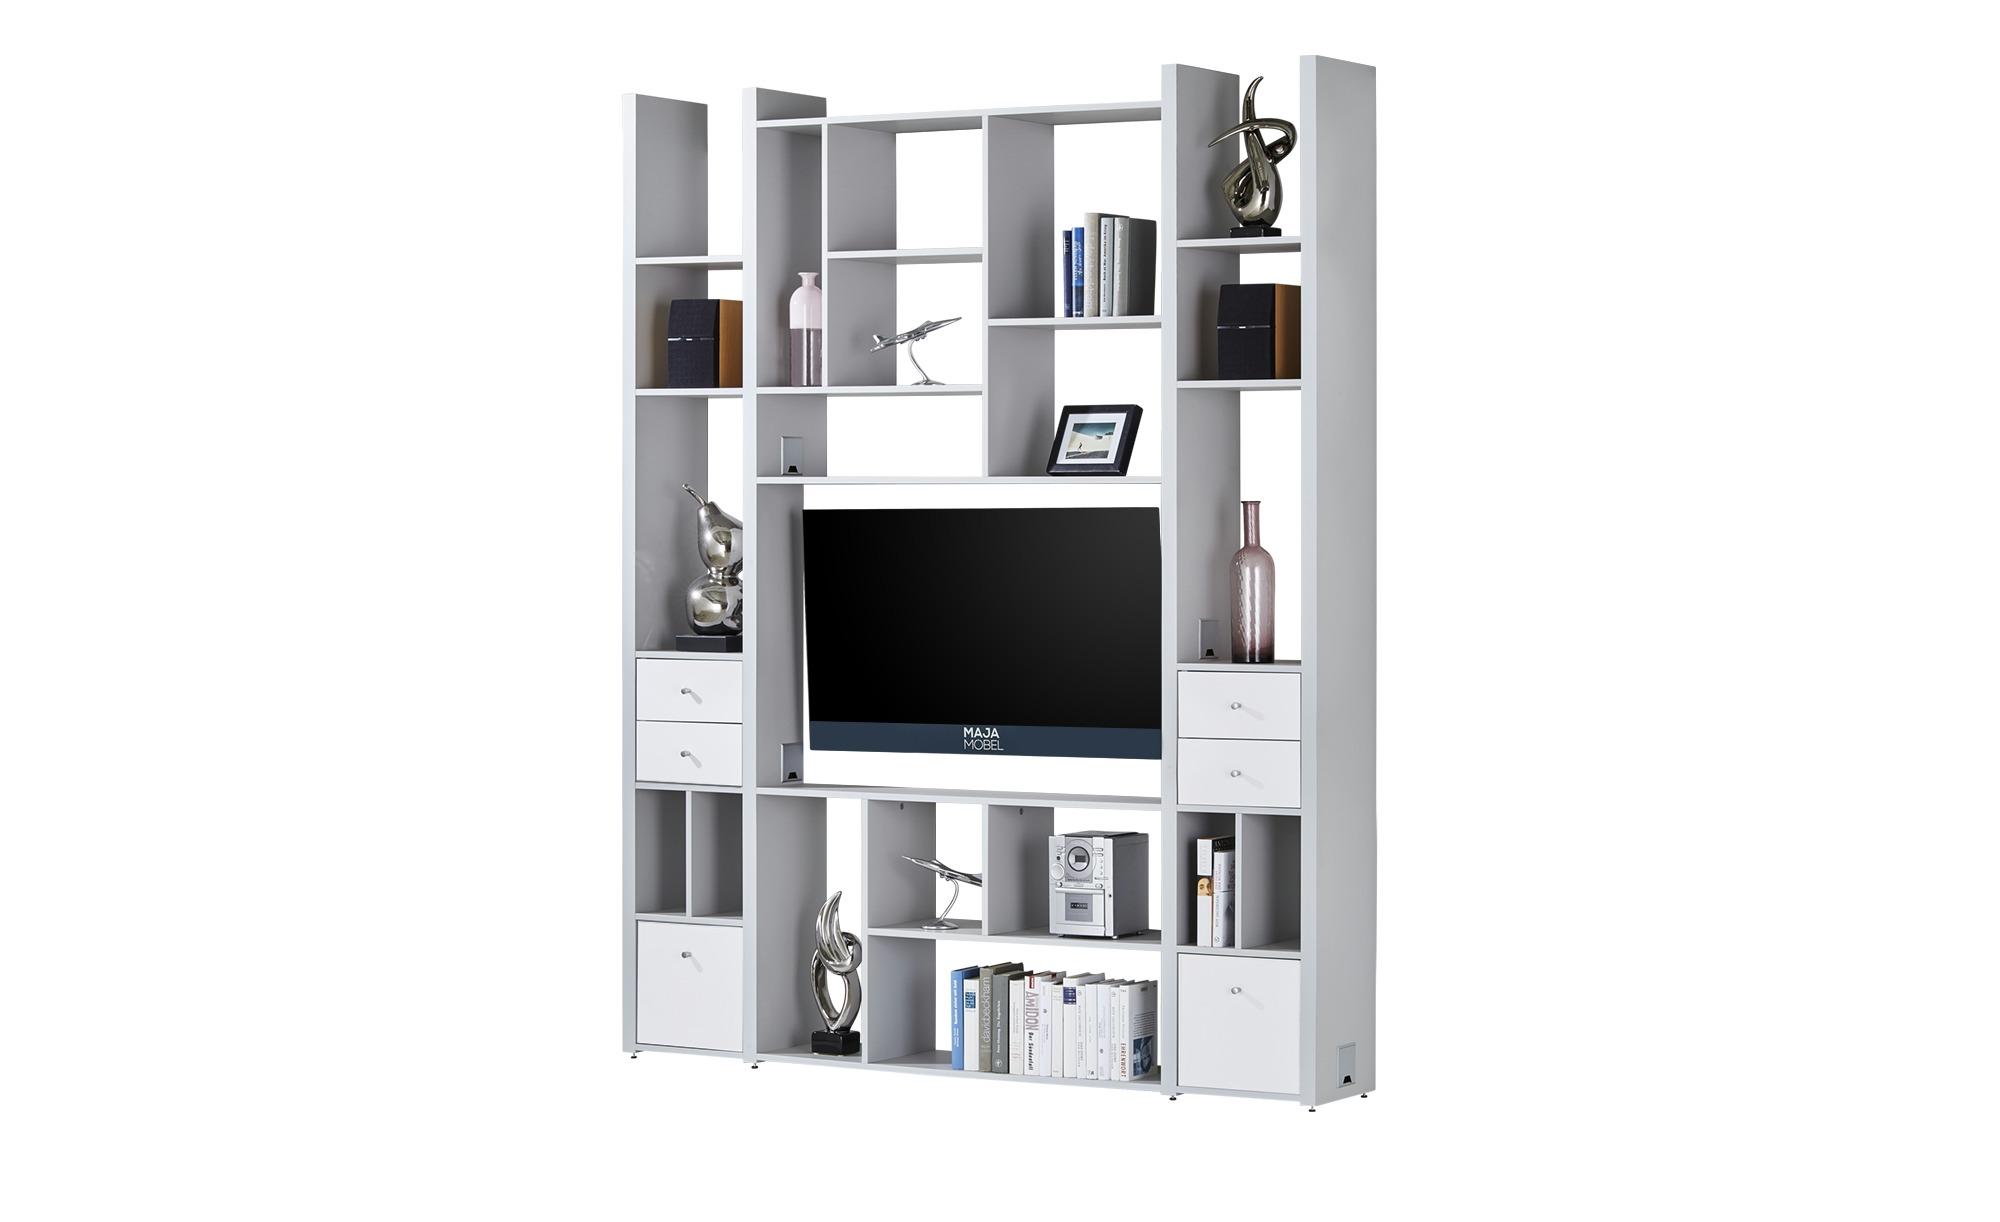 wandregal f hr breite 180 cm h he 225 cm grau online. Black Bedroom Furniture Sets. Home Design Ideas